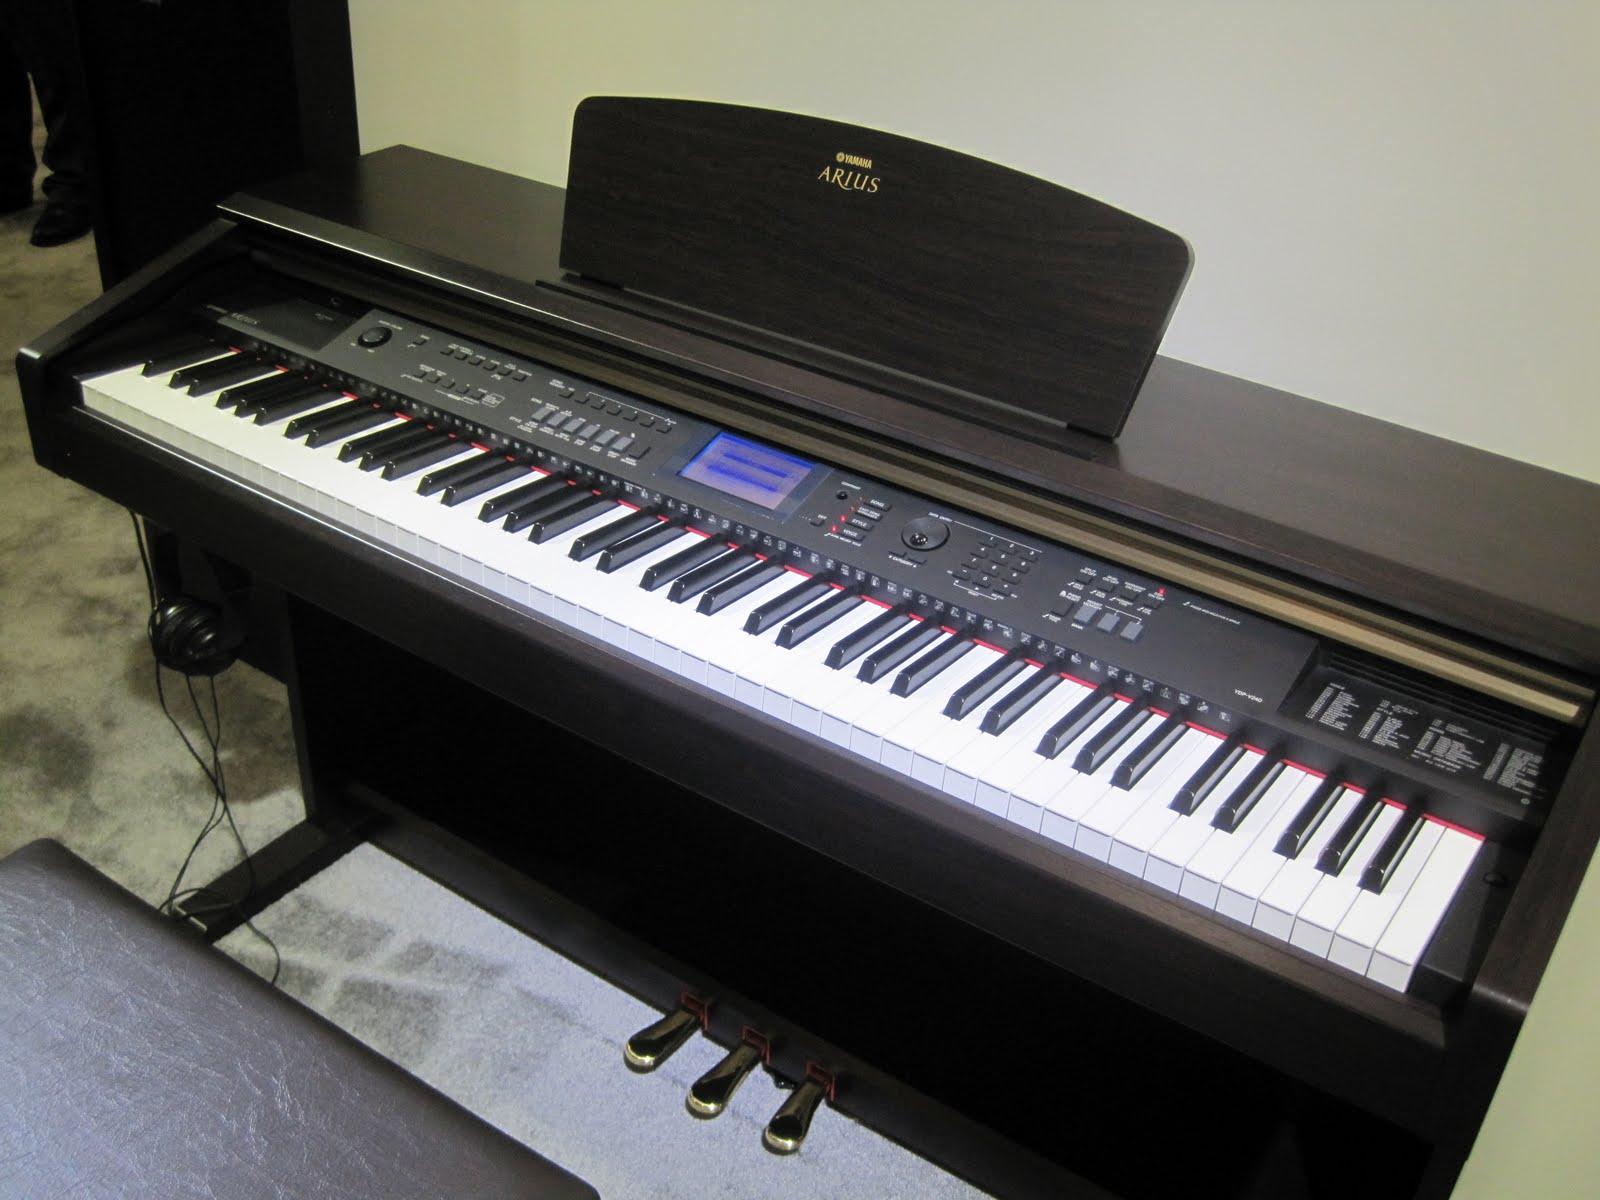 az piano reviews review yamaha ydp181 ydpv240 dgx640 digital pianos yamaha 39 s 3 best. Black Bedroom Furniture Sets. Home Design Ideas